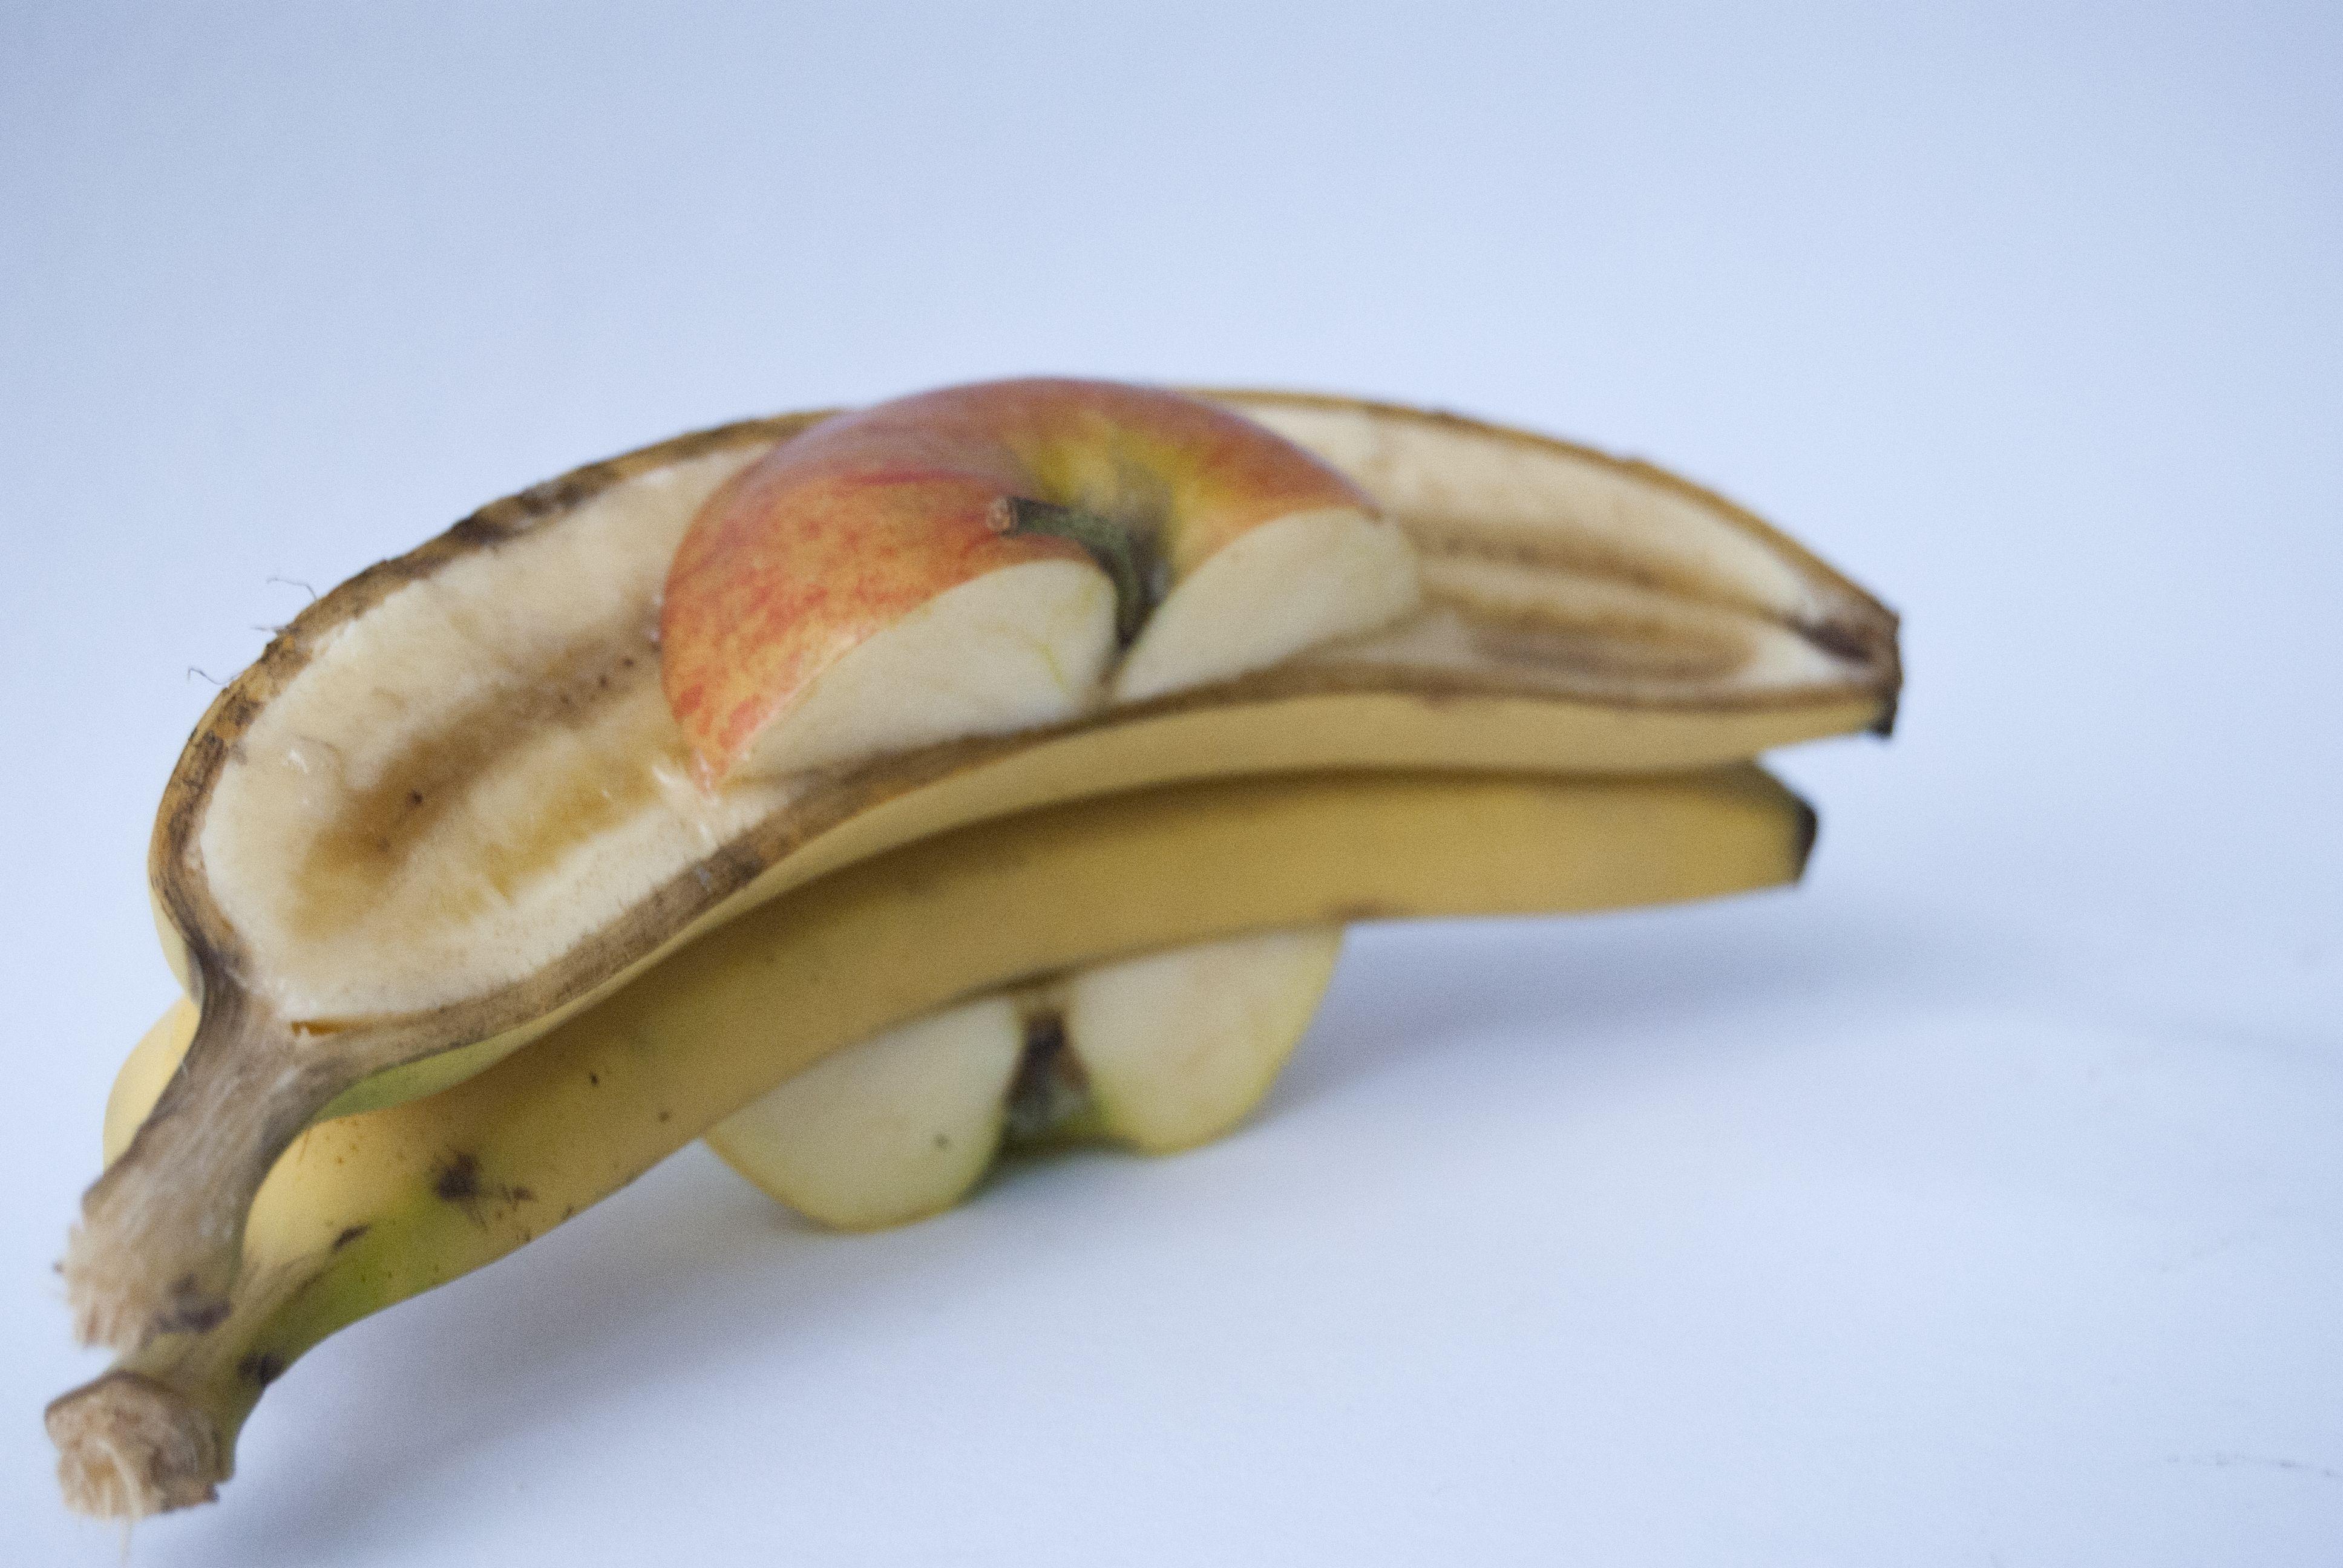 Fruit  Photography & Styling by Denise Hofman